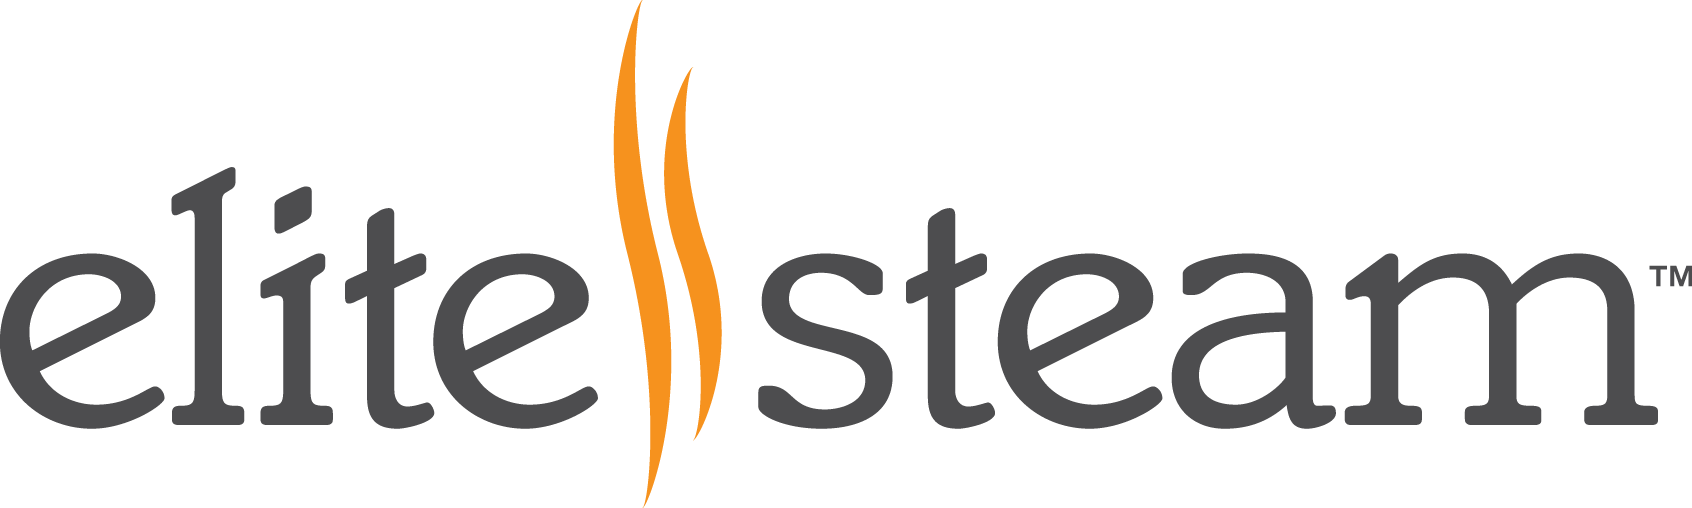 About Steamist Steam Shower Generators - EliteSteam Official Site